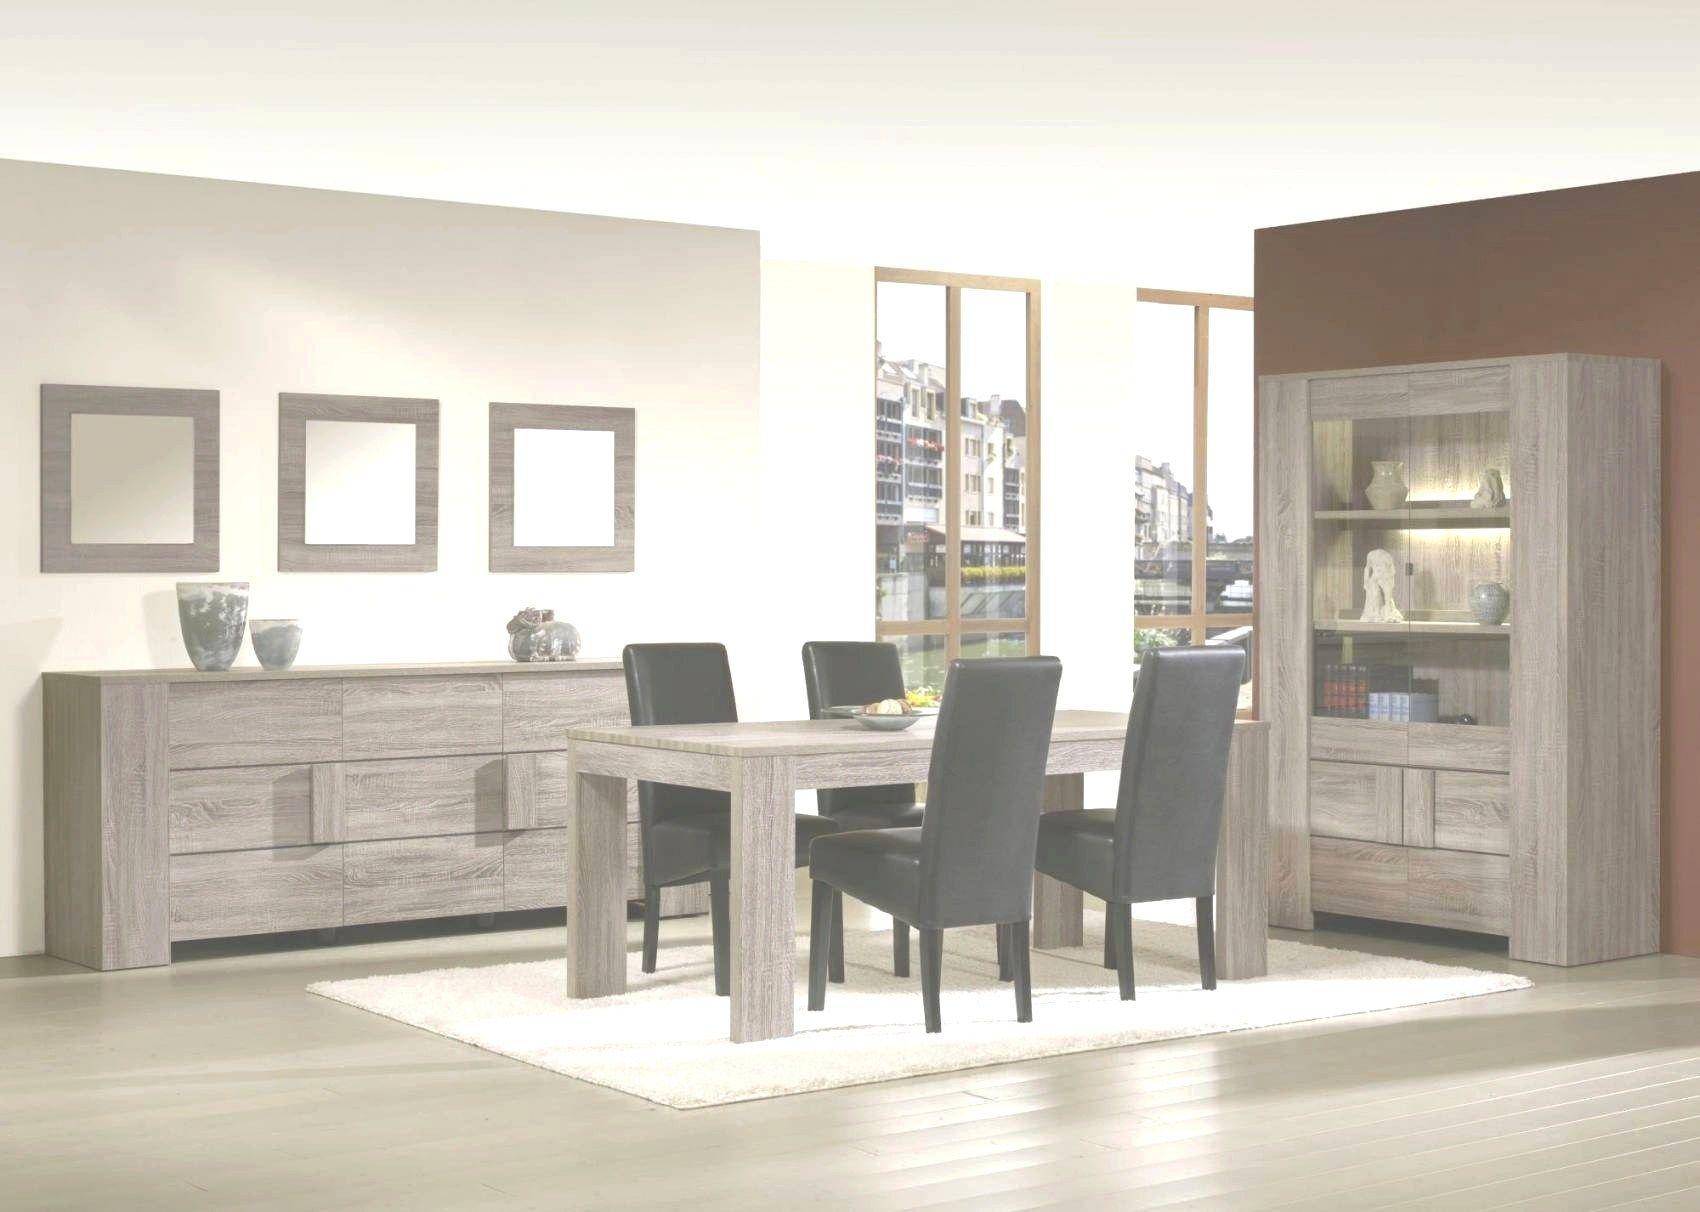 Beautiful Meuble Cuisine Inox Occasion Home Deco Salon Home Decor